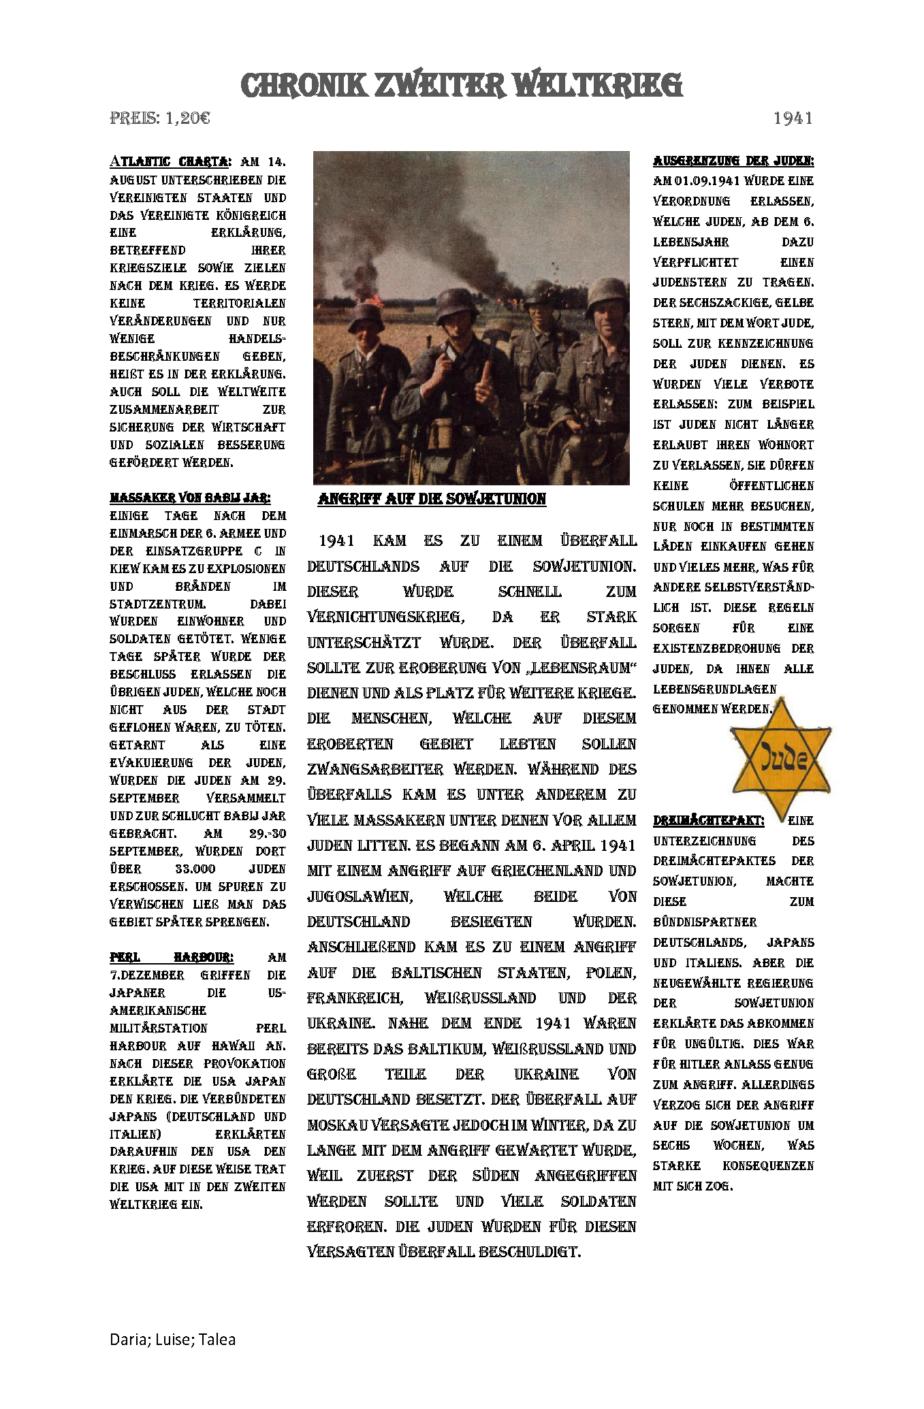 1941 Jahreschronik - Daria - Luise - Talea_Seite_1